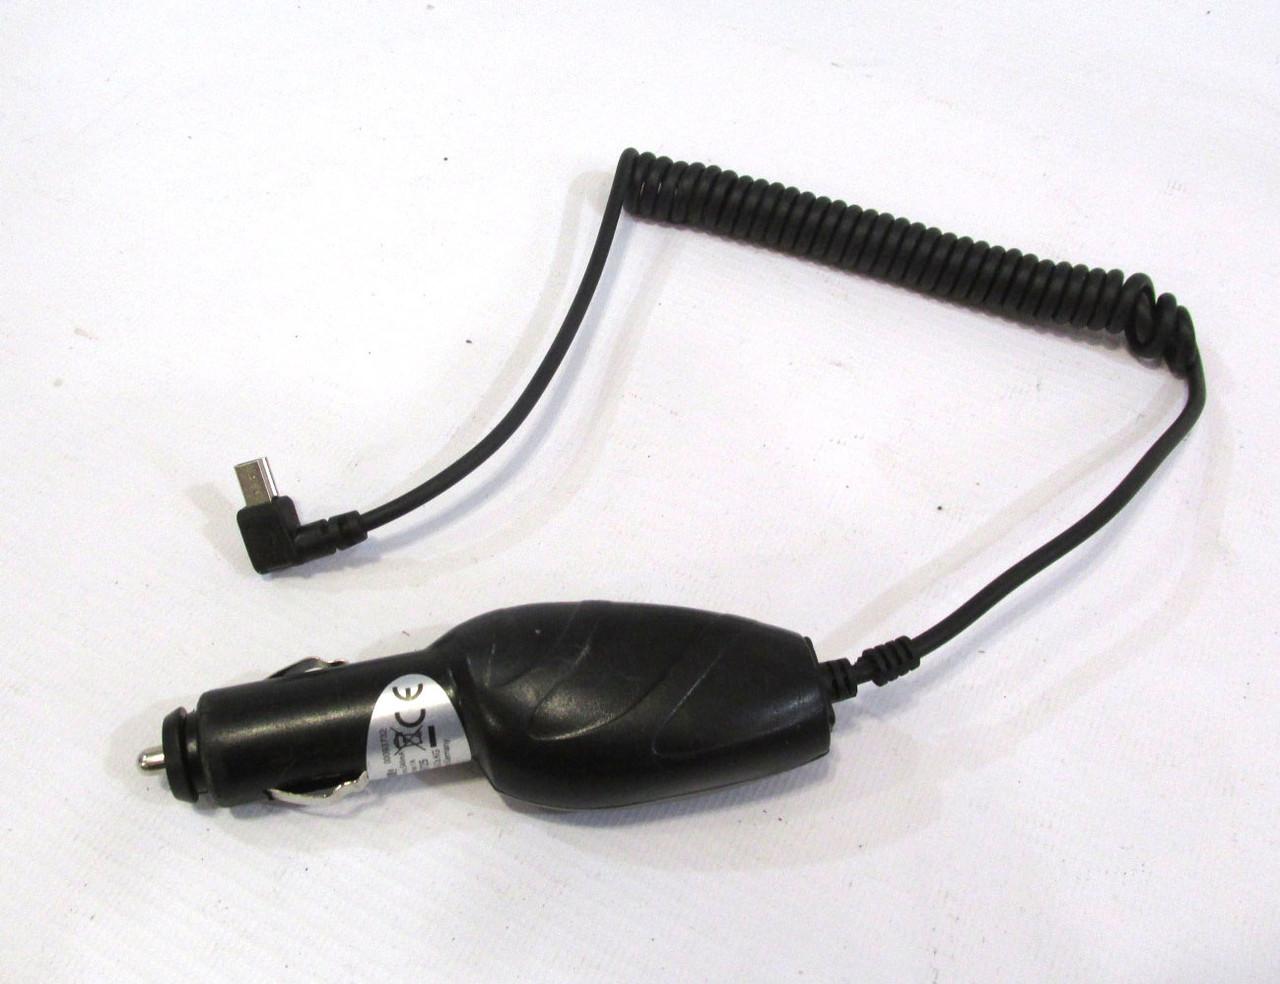 Адаптер от прикуривателя Mini USB, Hama, Отл сост!